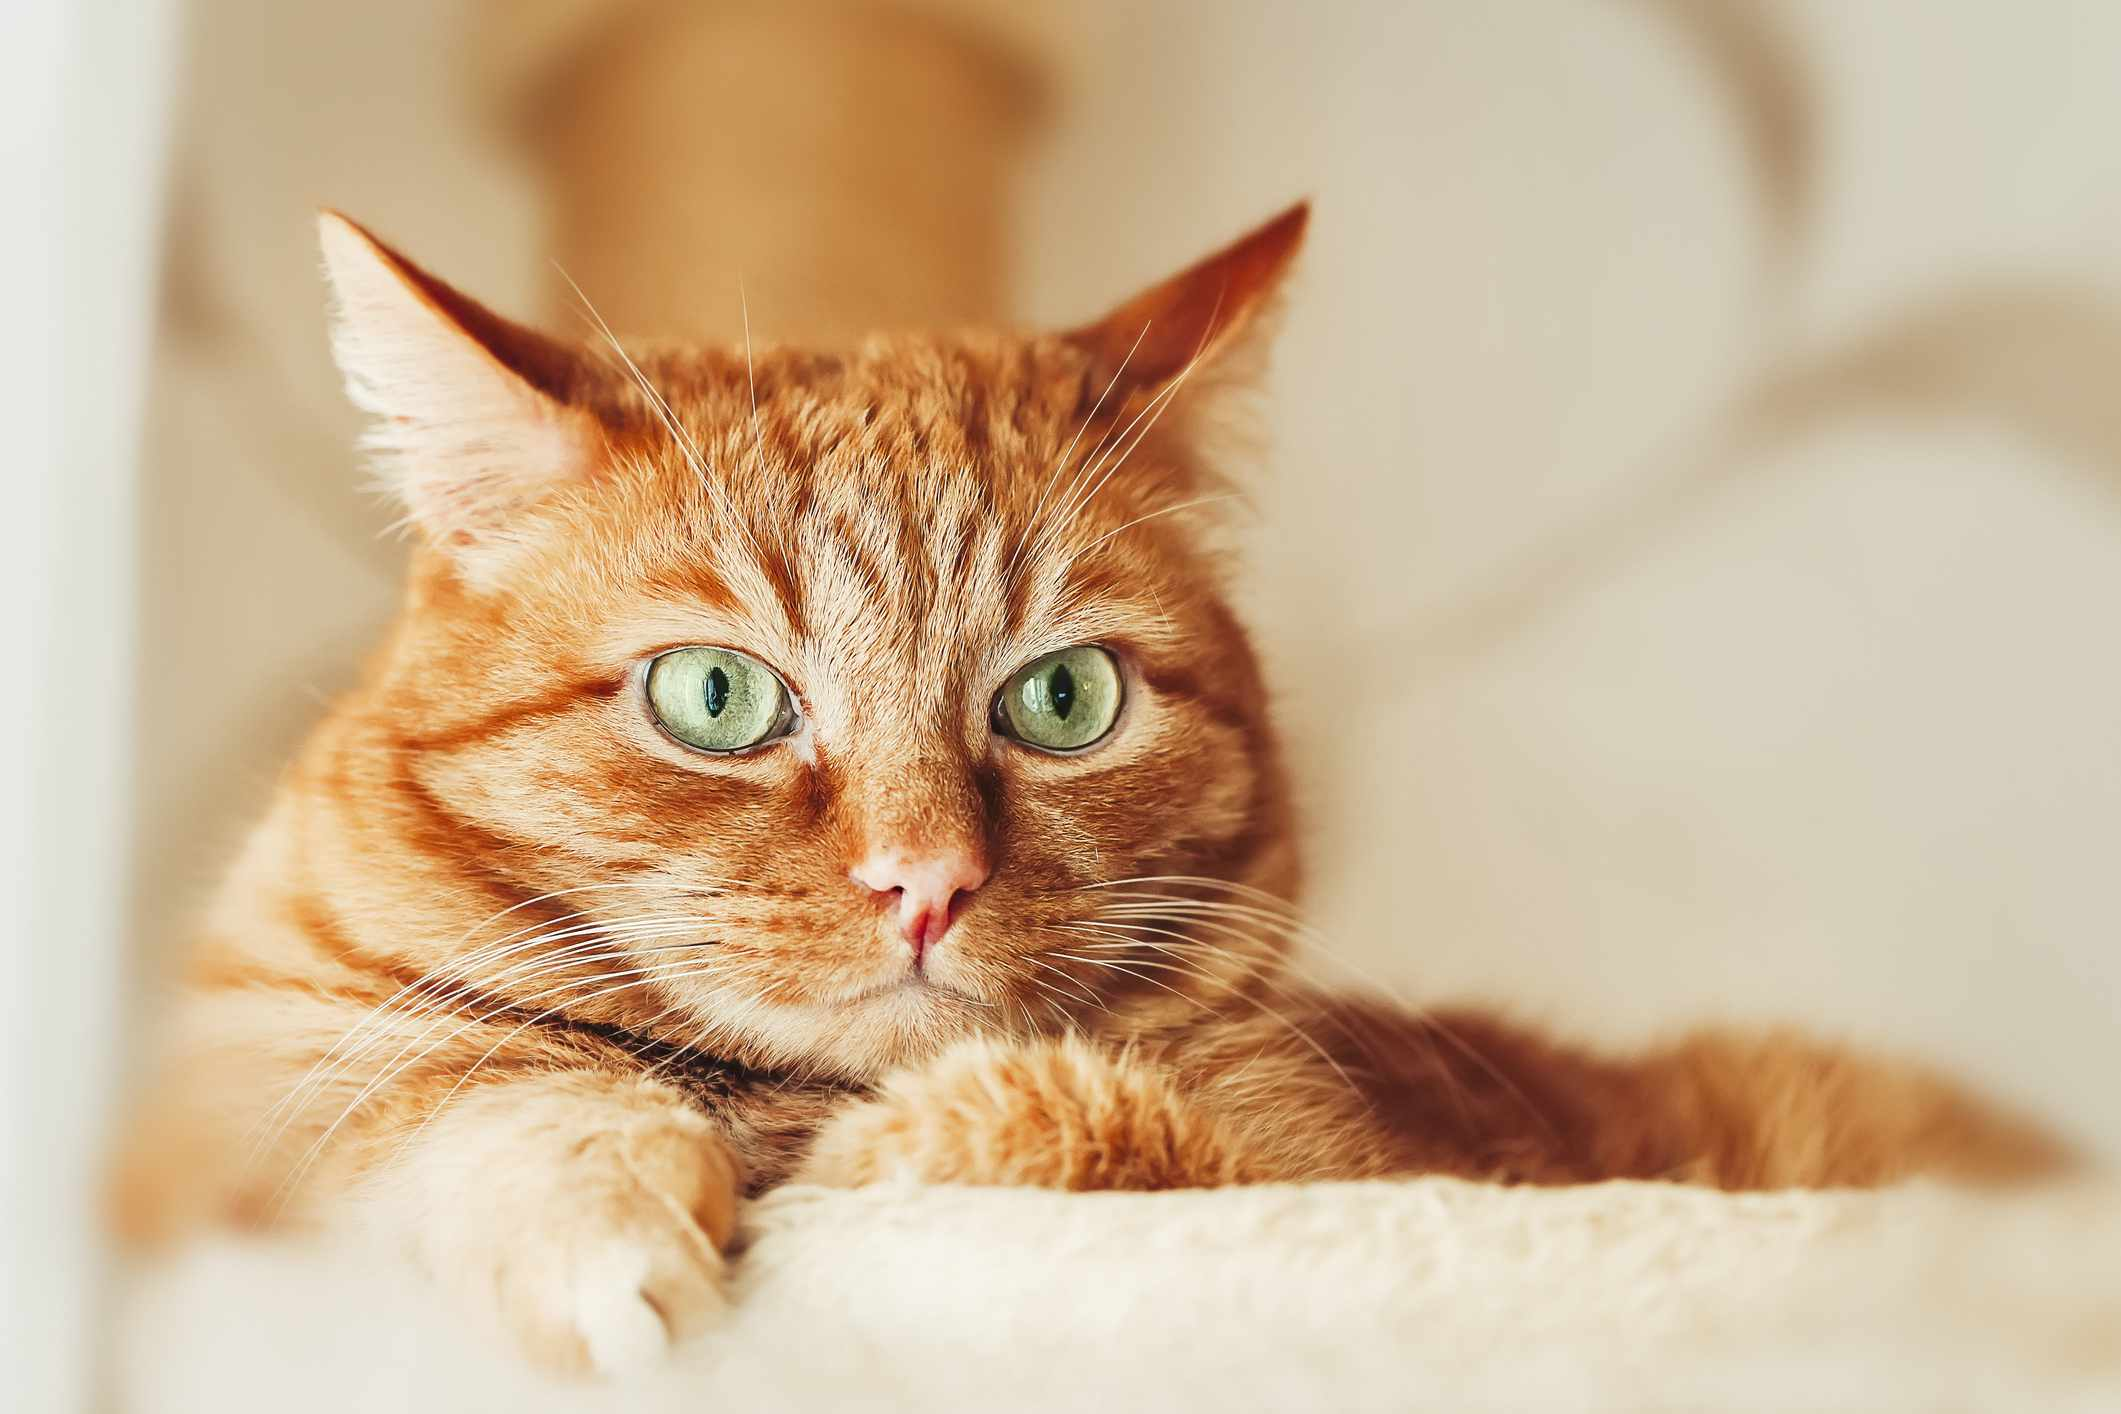 Portrait of orange cat with green eyes